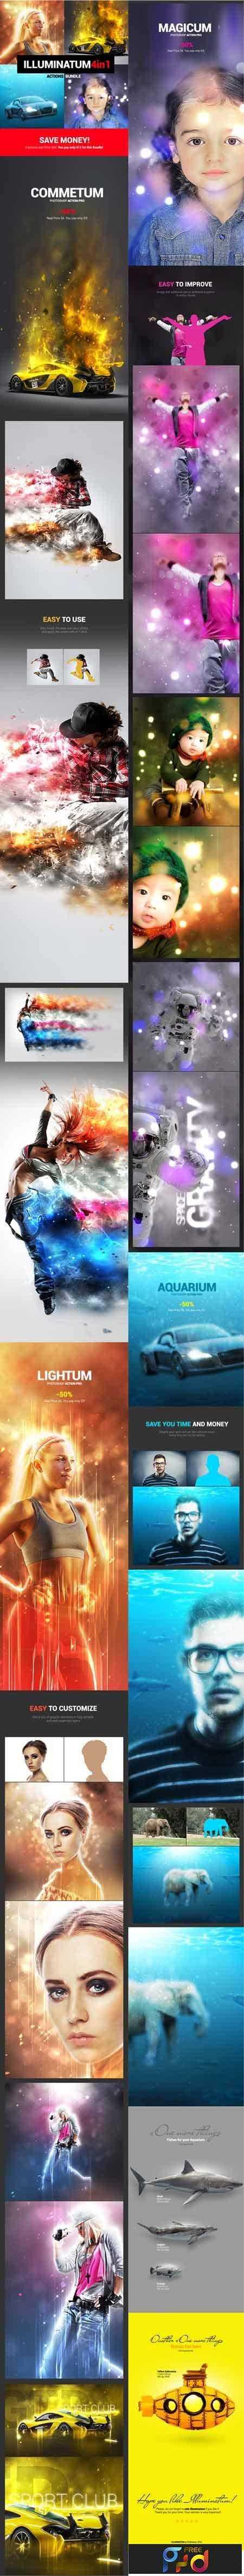 Illuminatum - 4in1 Photoshop Actions Bundle 18134079 - FreePSDvn